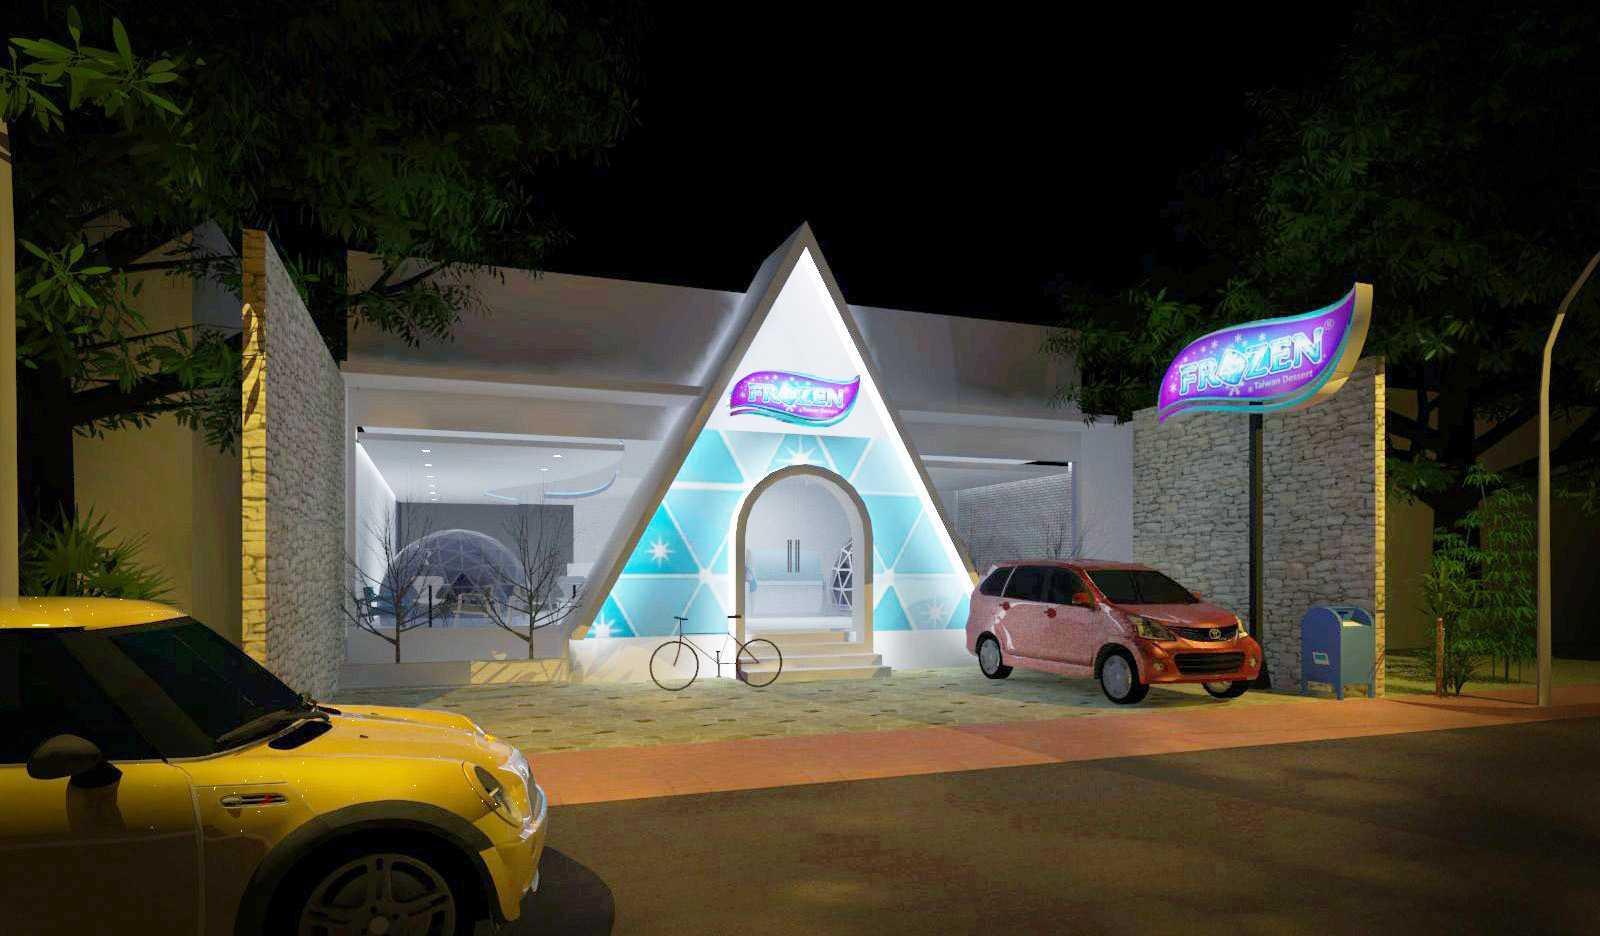 Rqt8 Frozen Cafe Garut Kota, Garut Regency, West Java, Indonesia Garut Night-Rendering-Facade-Edited   26815